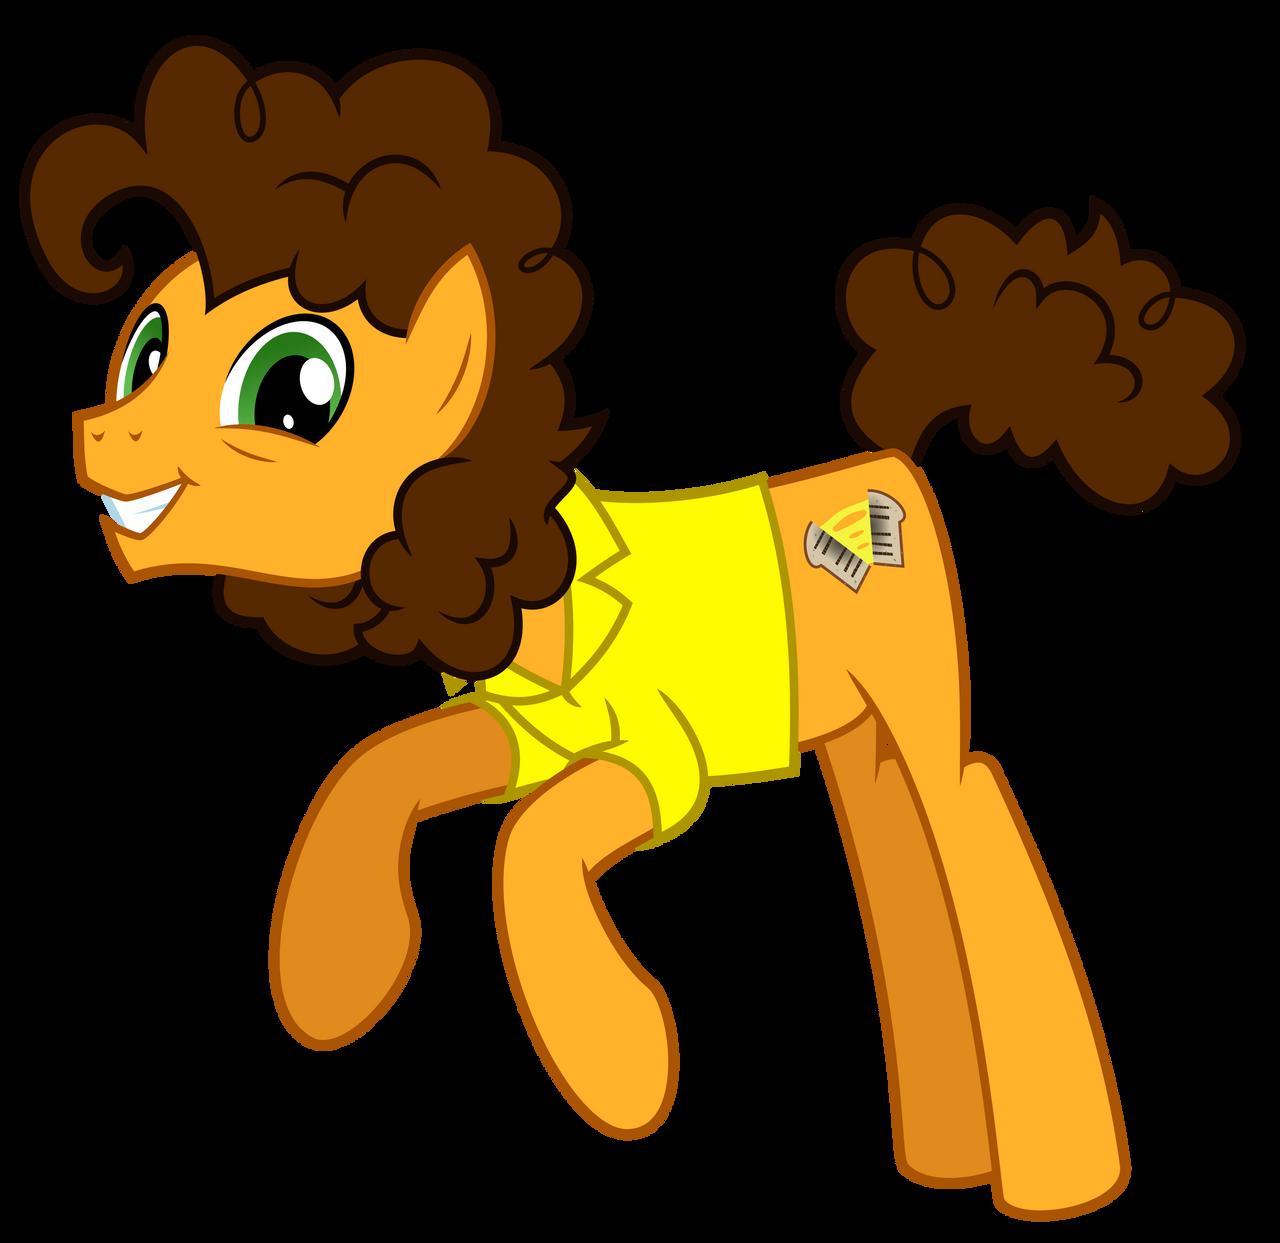 The Super Duper Party Pony by masemj on DeviantArt